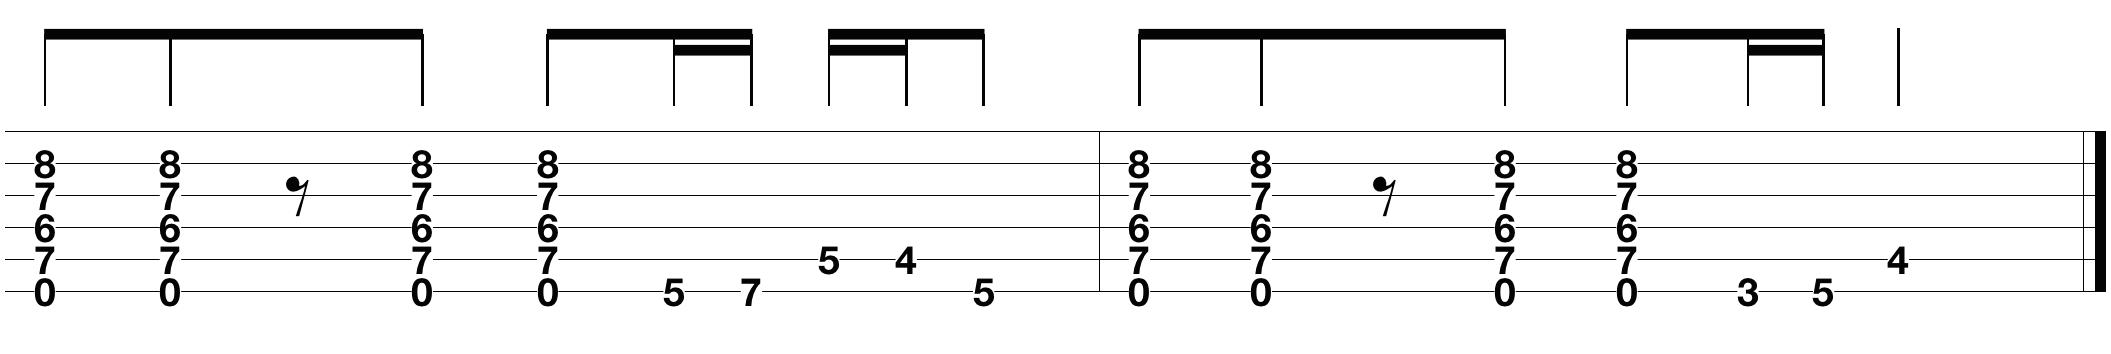 classic-rock-guitar-riffs_3.png